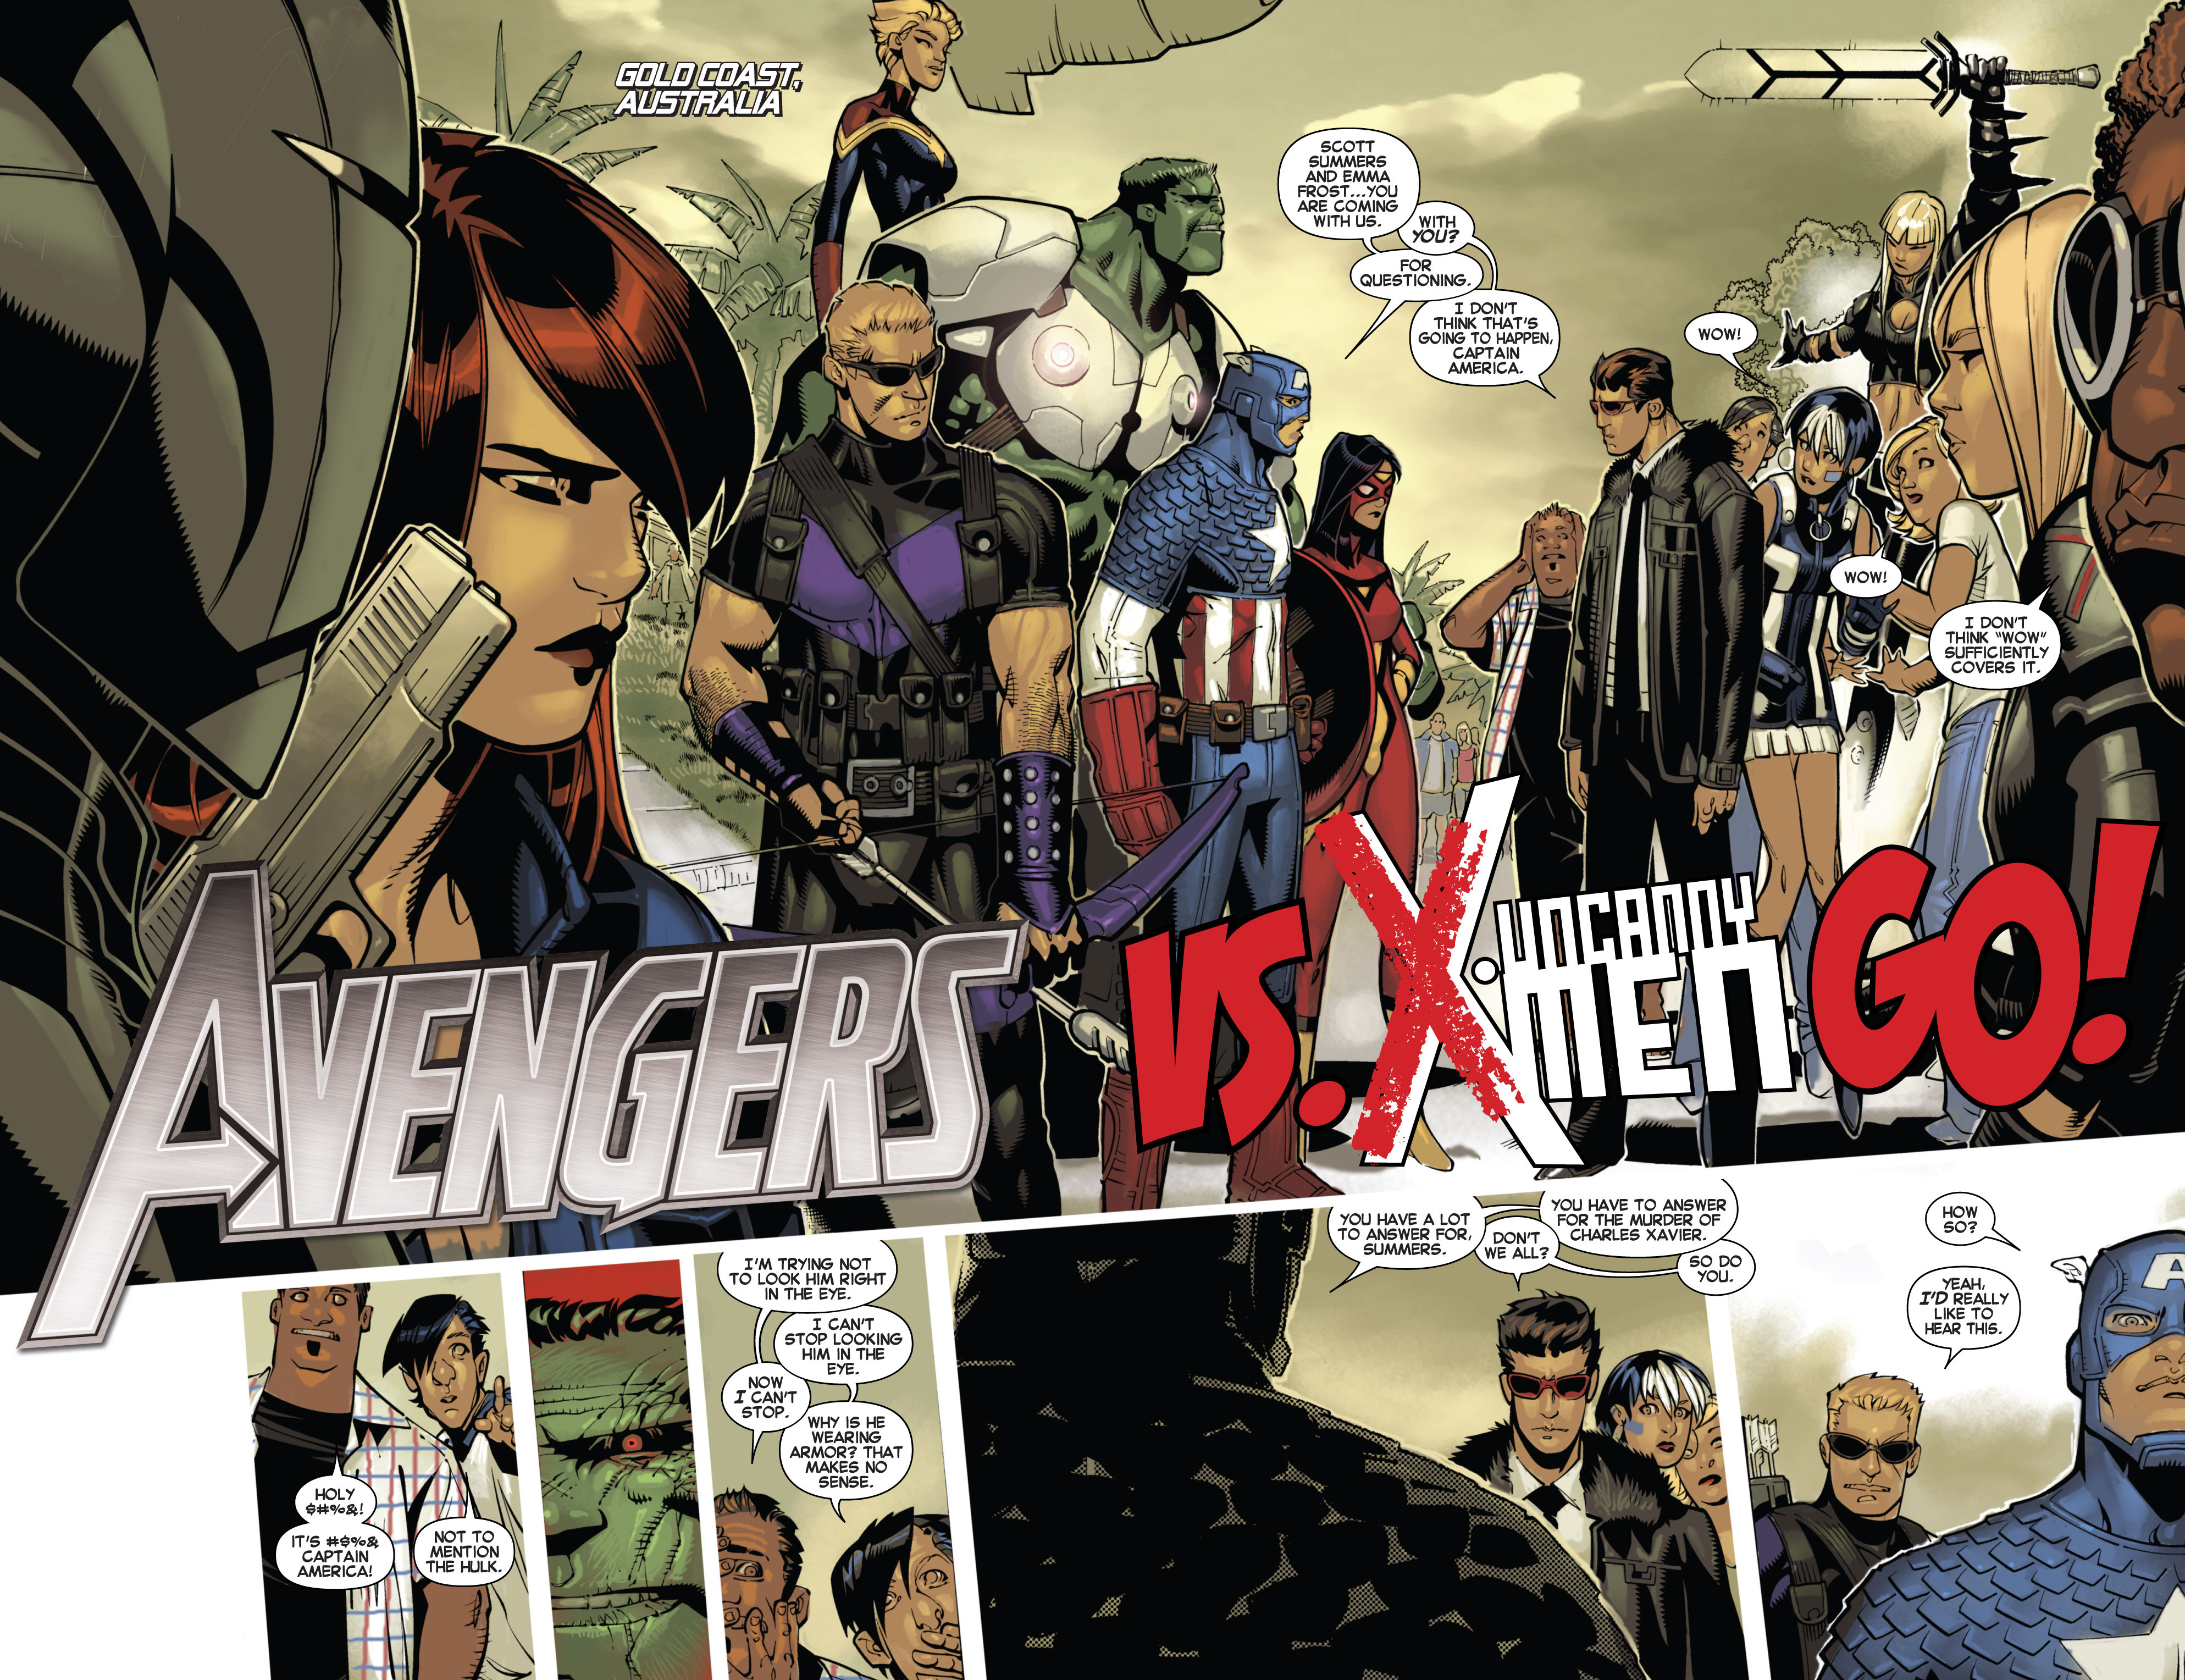 Read online Uncanny X-Men (2013) comic -  Issue # _TPB 1 - Revolution - 47